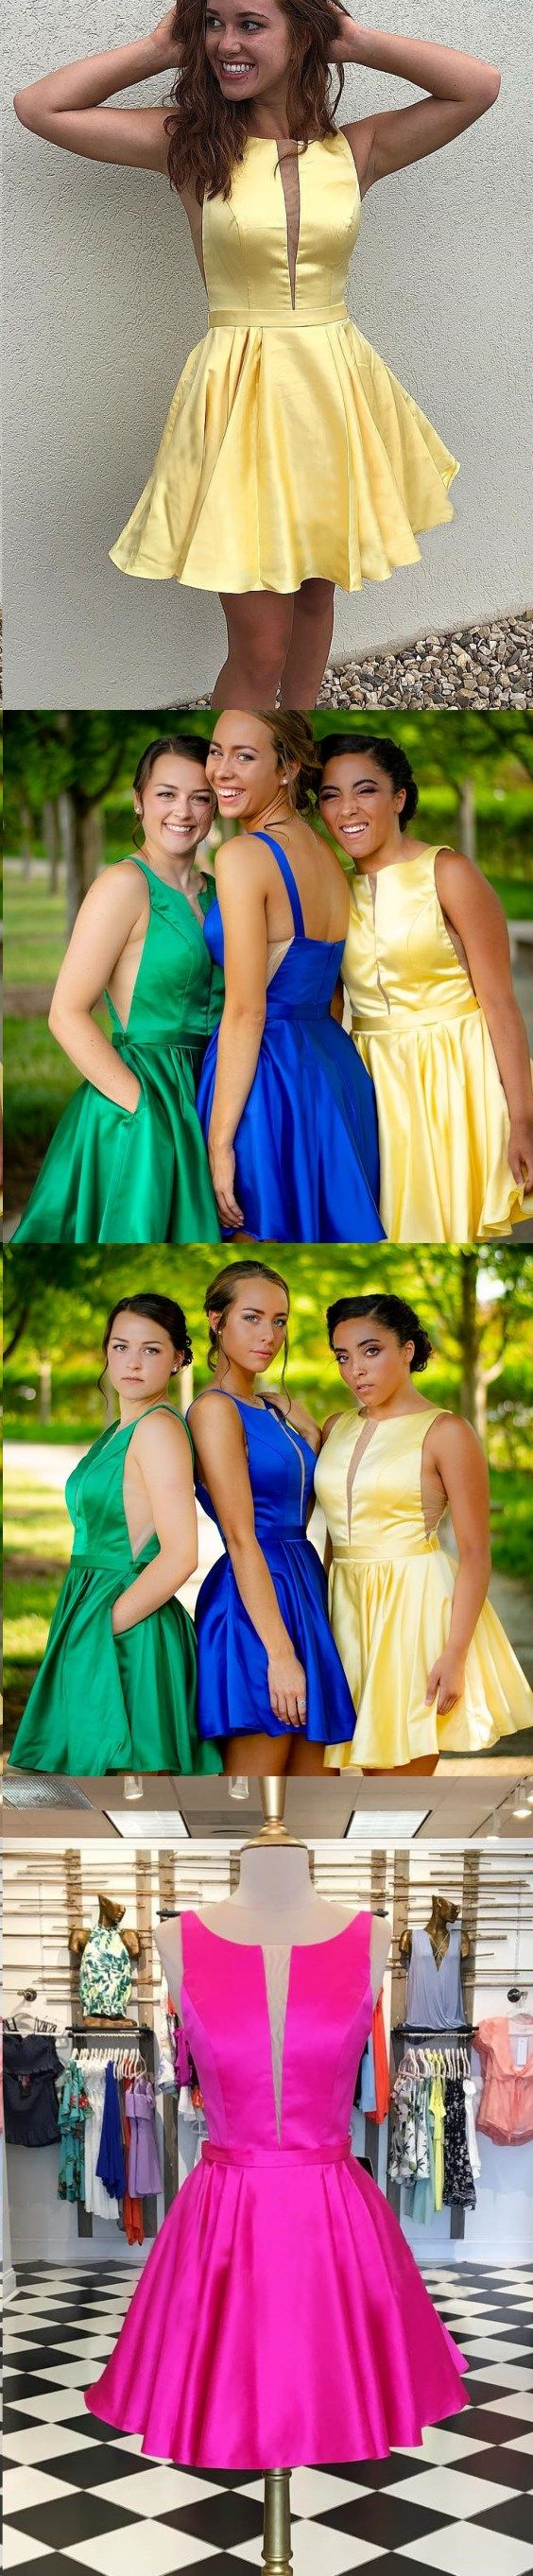 Cheap homecoming dresses a line royal blue short prom dress yellow